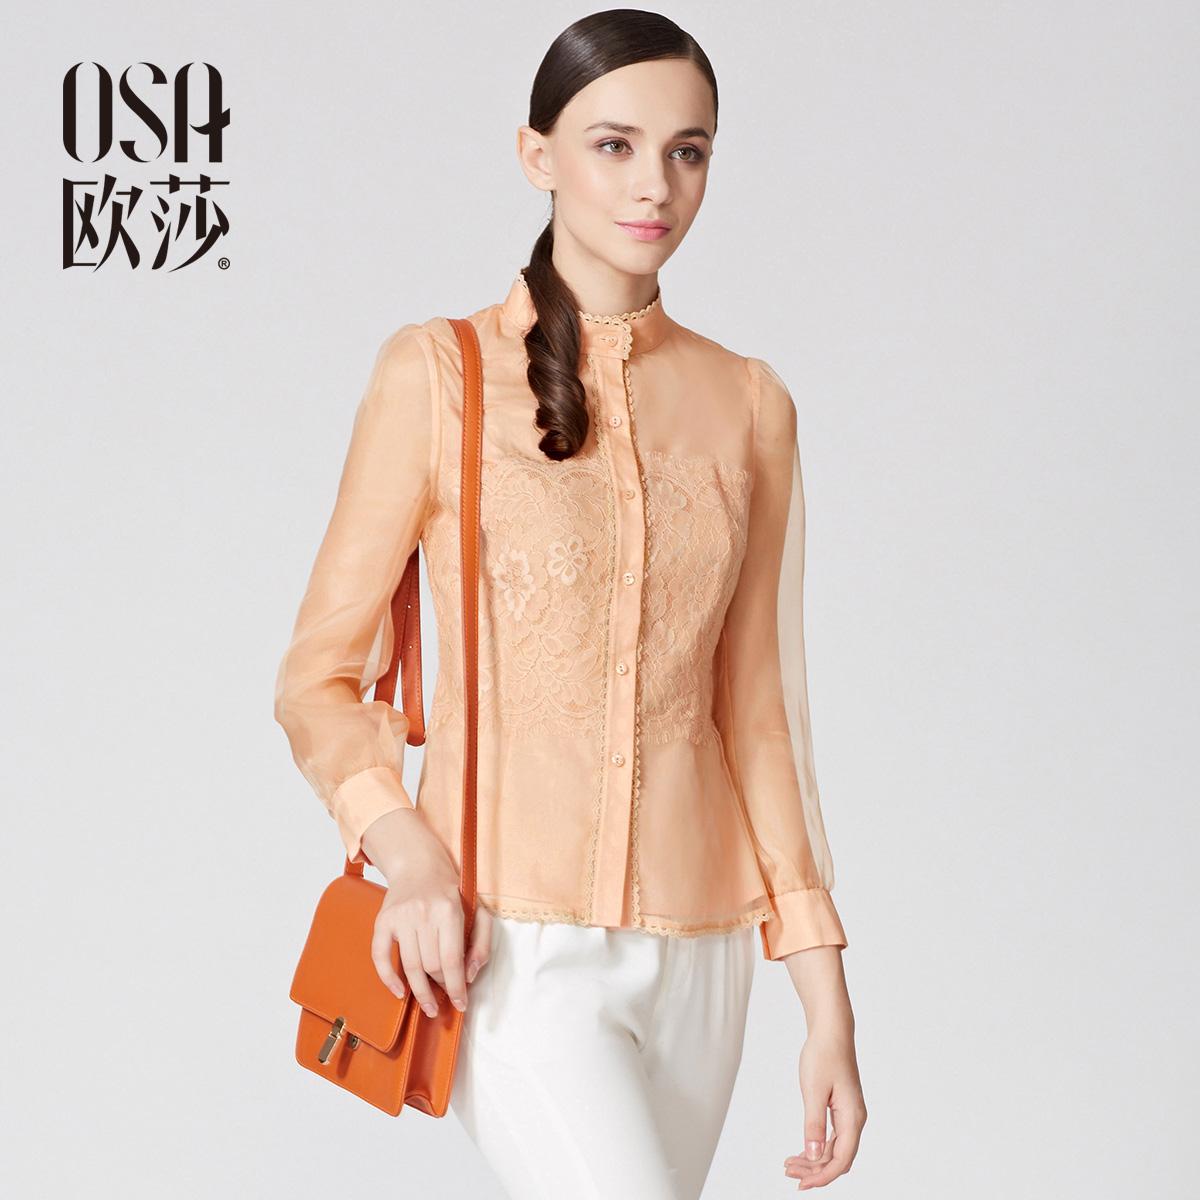 OSA 2014 Spring Shirt Lace Stand Collar Long Puff Sleeve Blouse Womens Slim Single Breasted Fashion Shirt SC410059(China (Mainland))